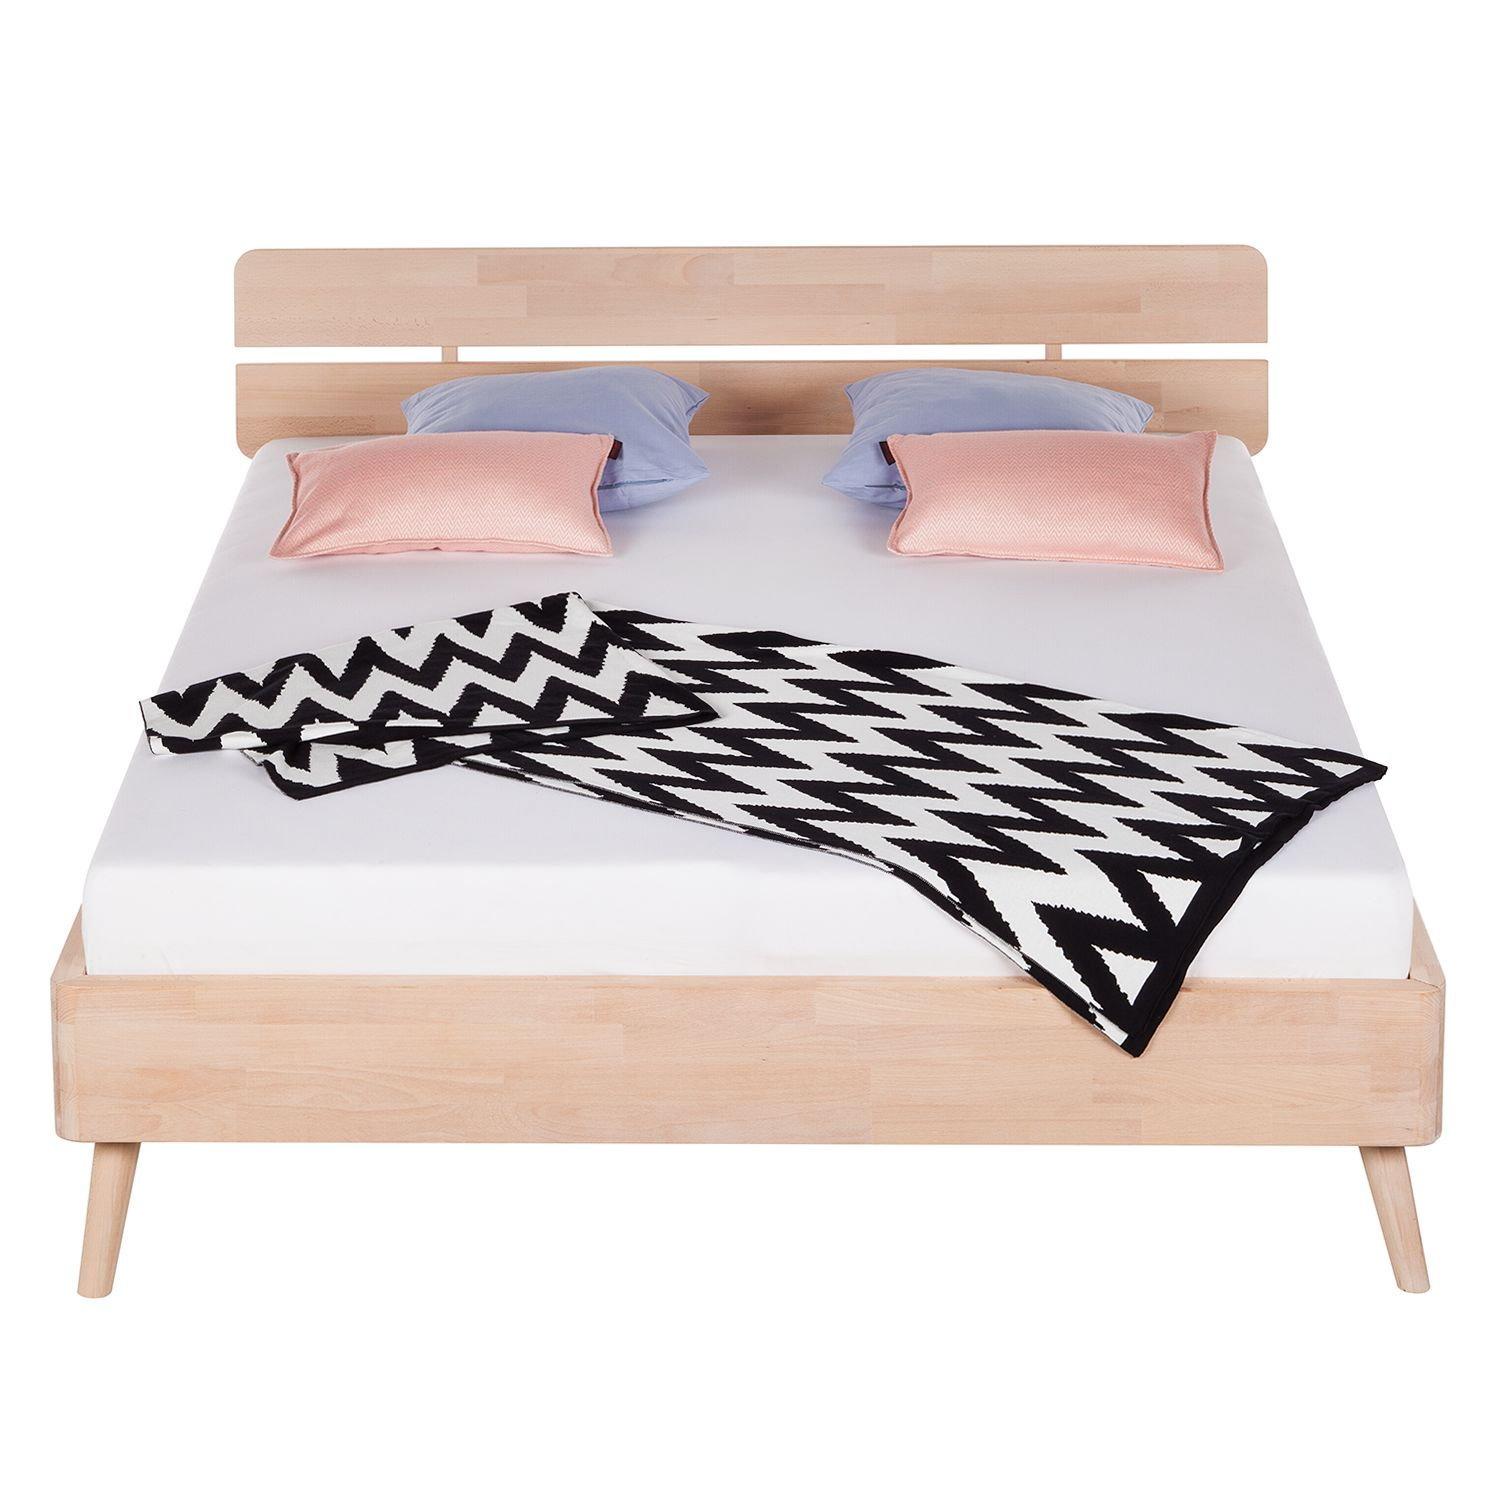 bett 160x200 cm massivholz buche ehebett doppelbett holzbett schlafzimmer m bel m bel wohnen. Black Bedroom Furniture Sets. Home Design Ideas